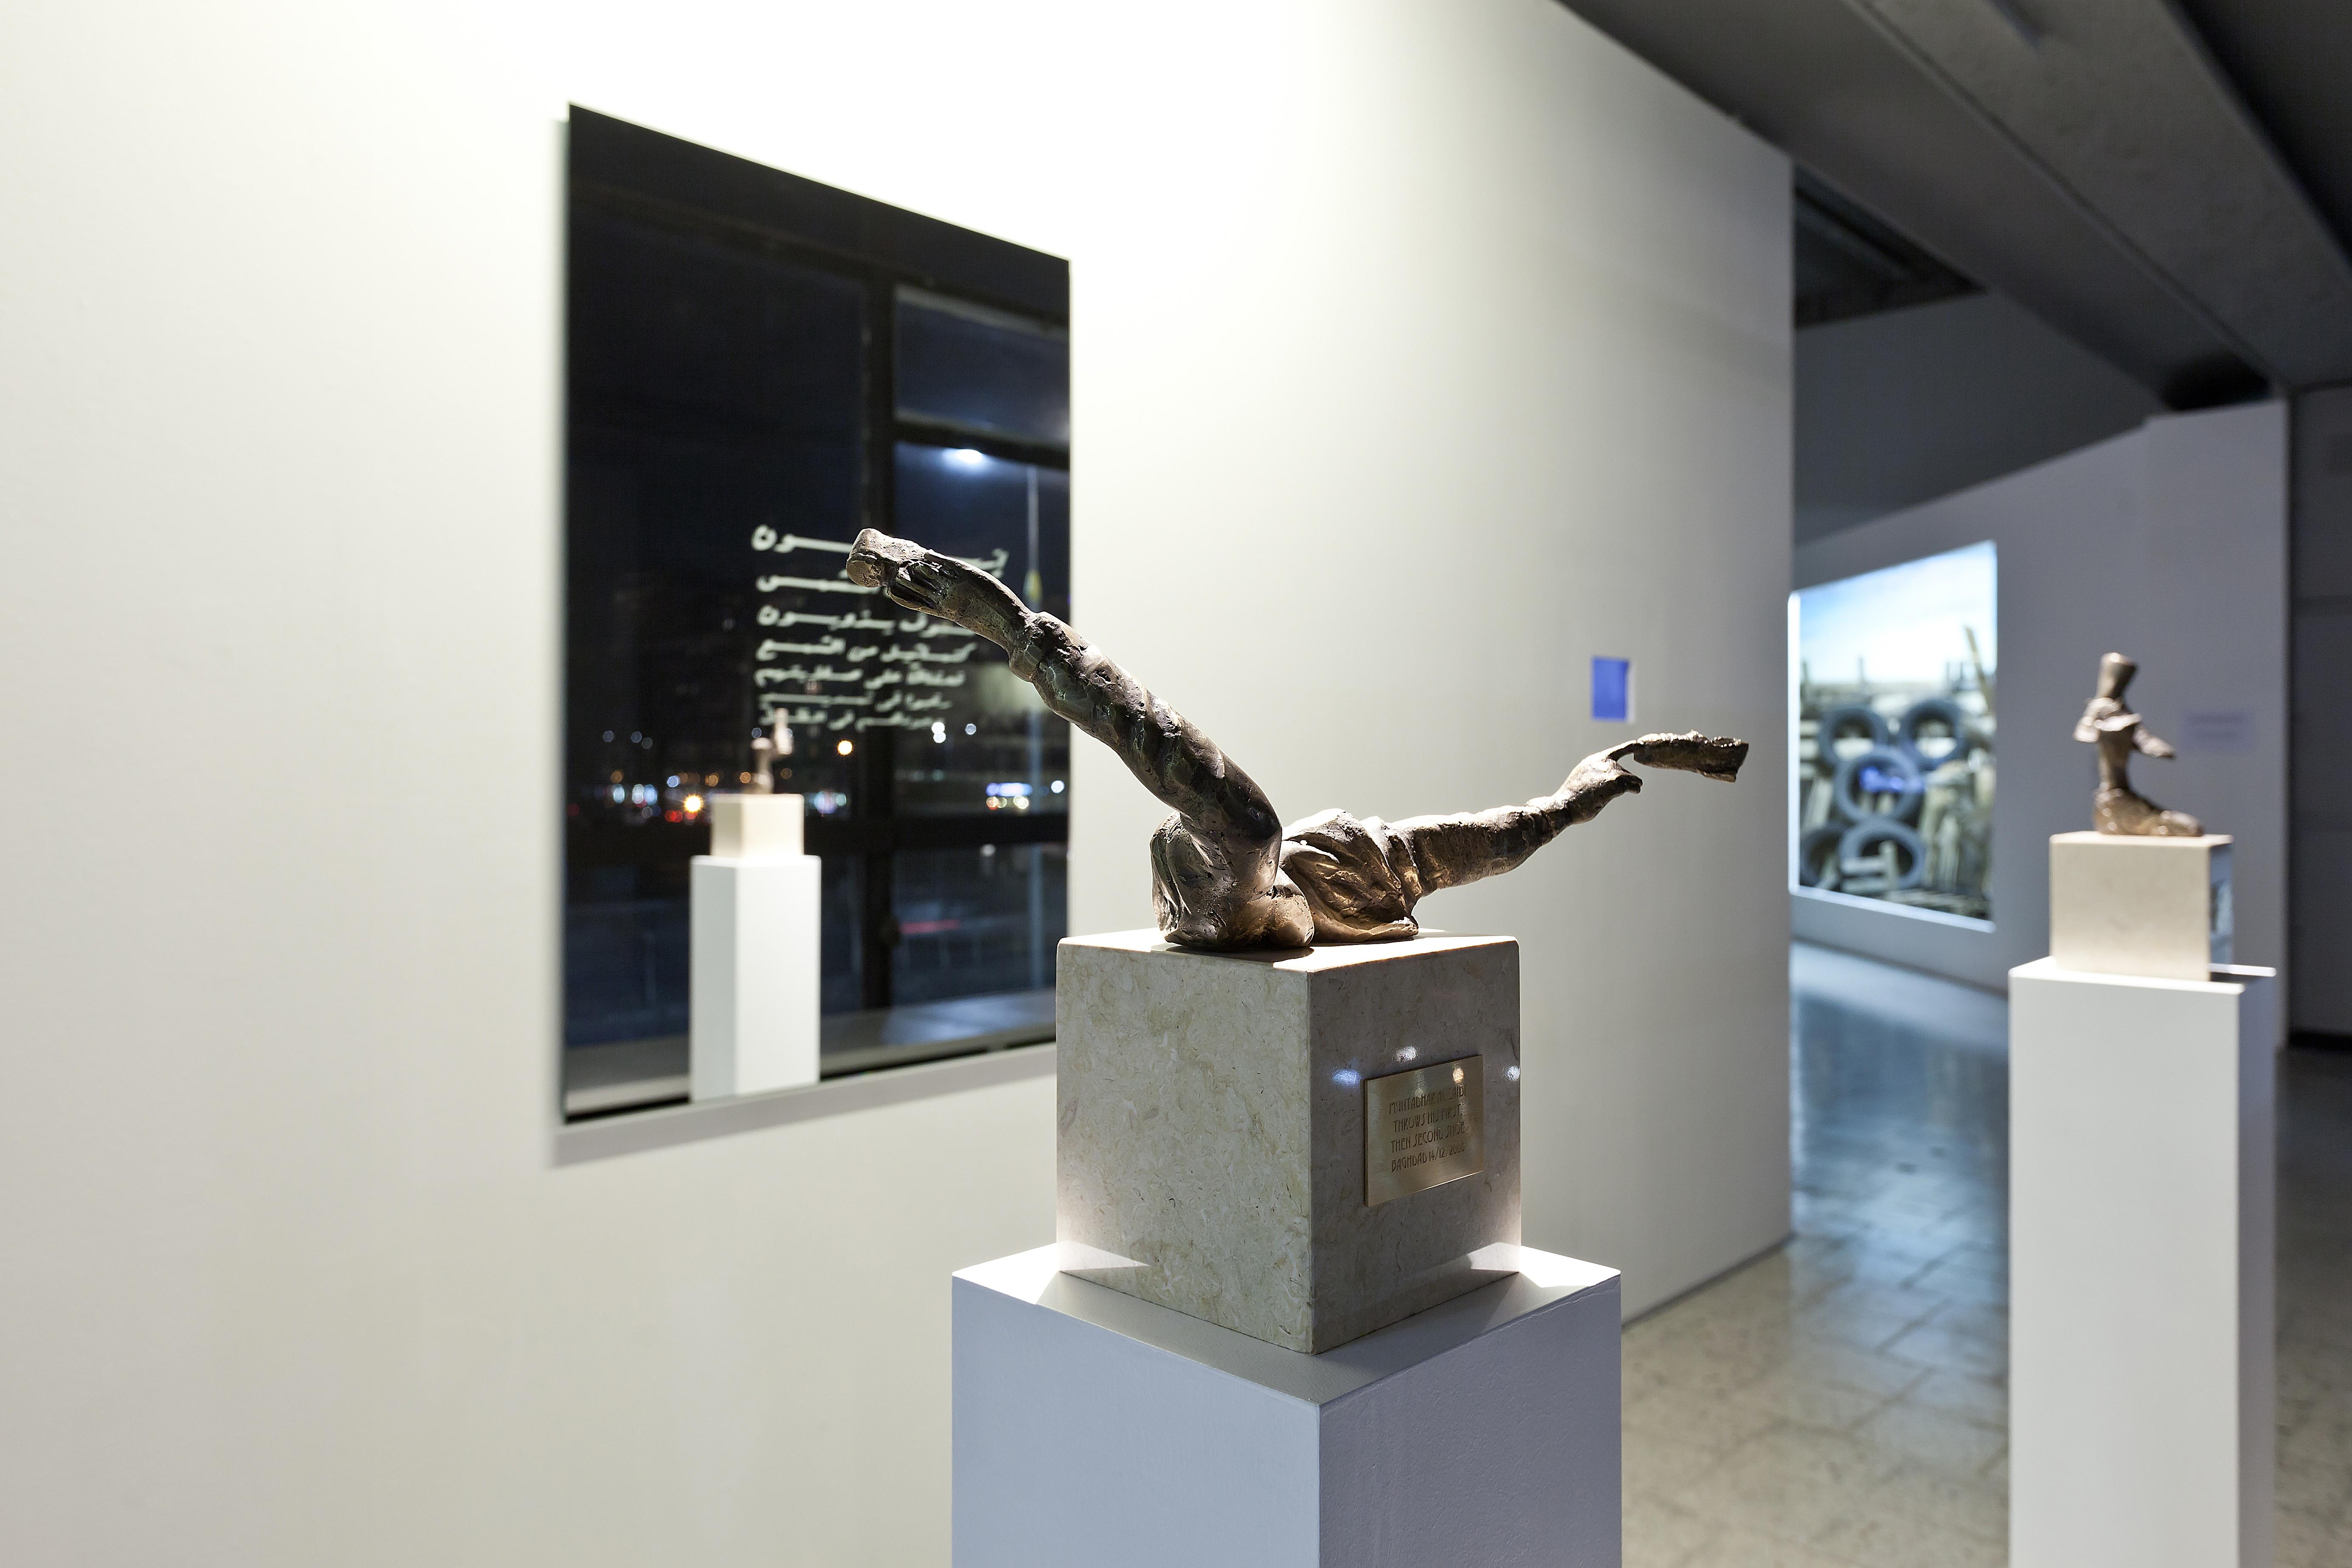 Haig Aivazian, Pożegnalne pocałunki, 2013